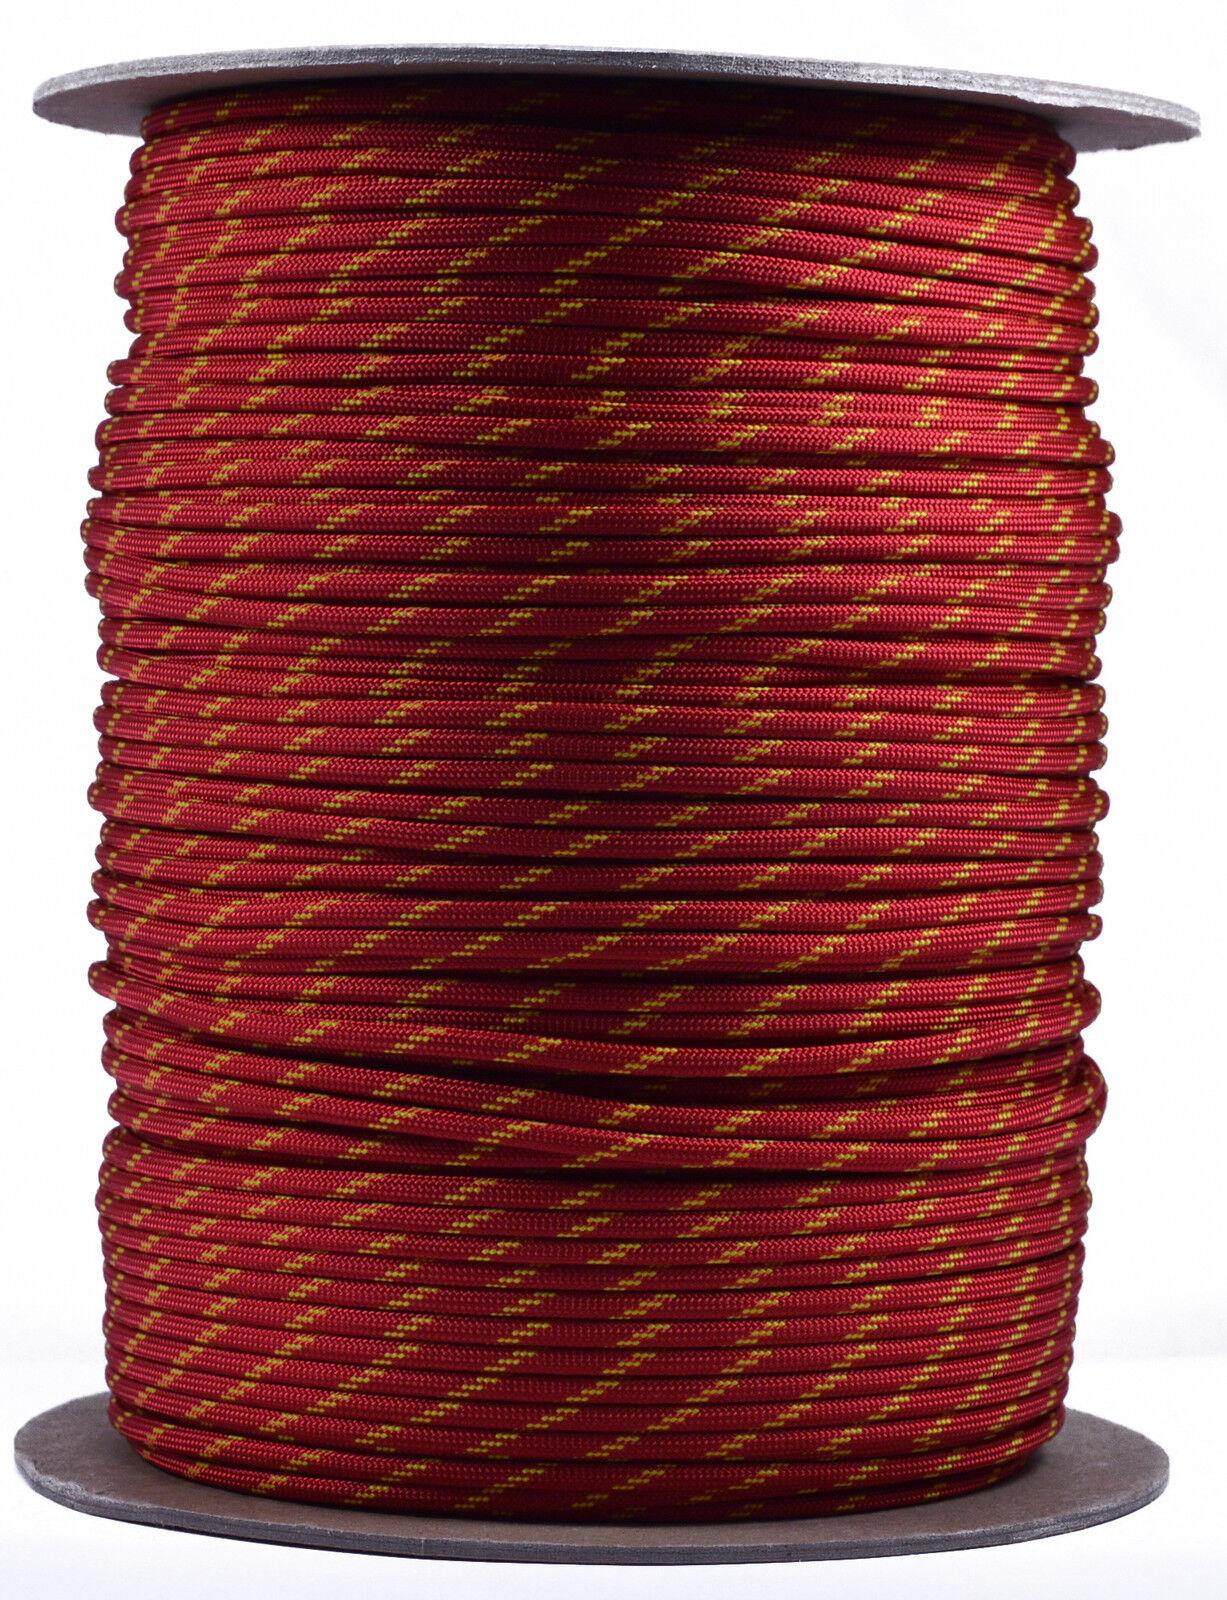 Sunburst  550 Paracord Rope 7 strand Parachute Cord  1000 Foot Spool